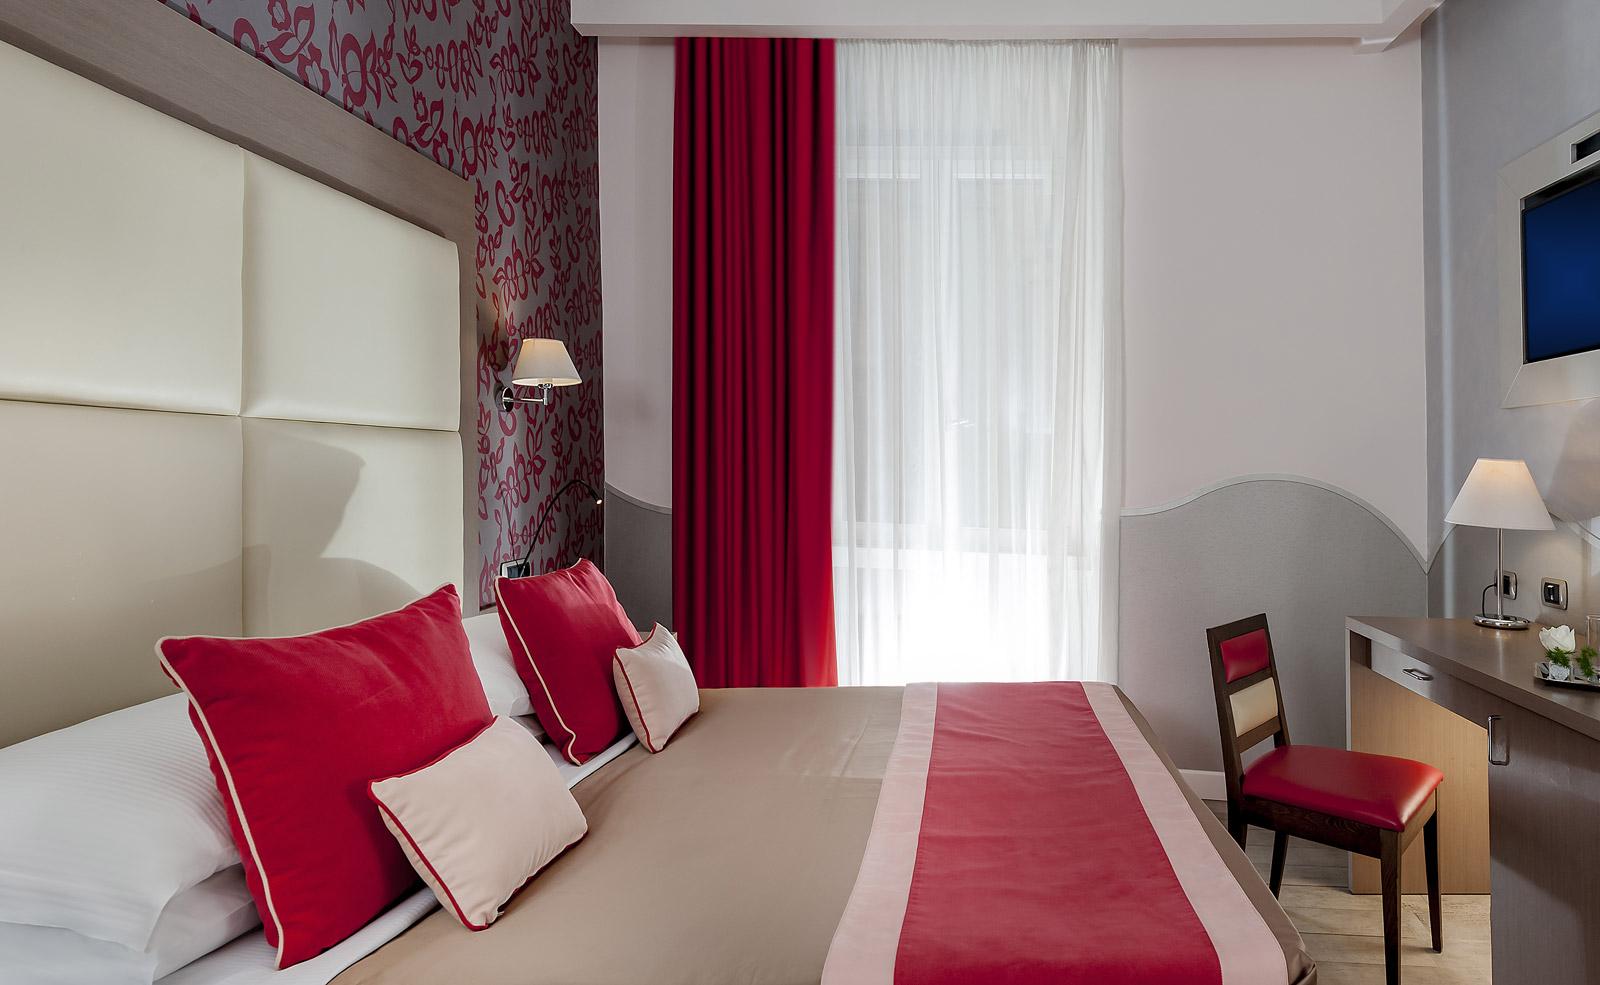 Camera matrimoniale hotel roma camera matrimoniale roma for Camera roma